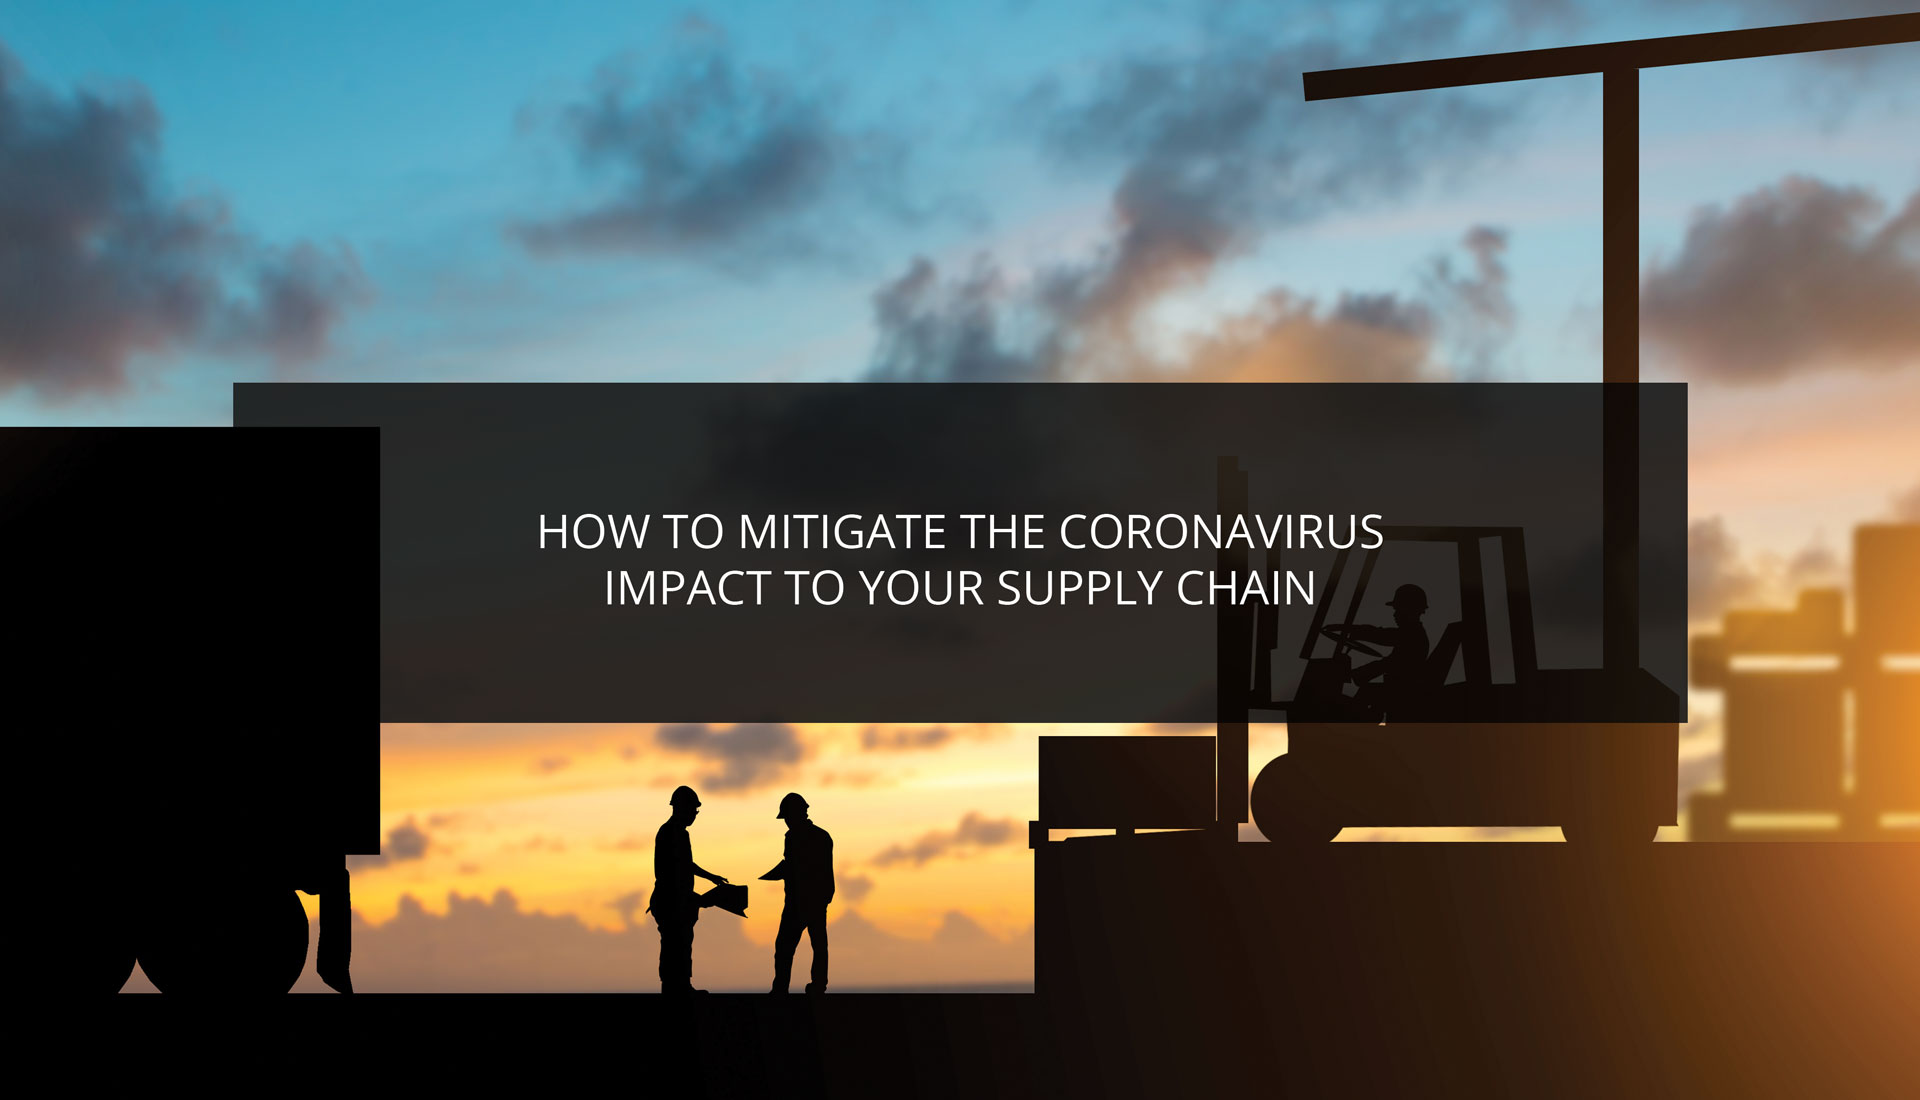 How to Mitigate the Coronavirus Impact to Your Supply Chain